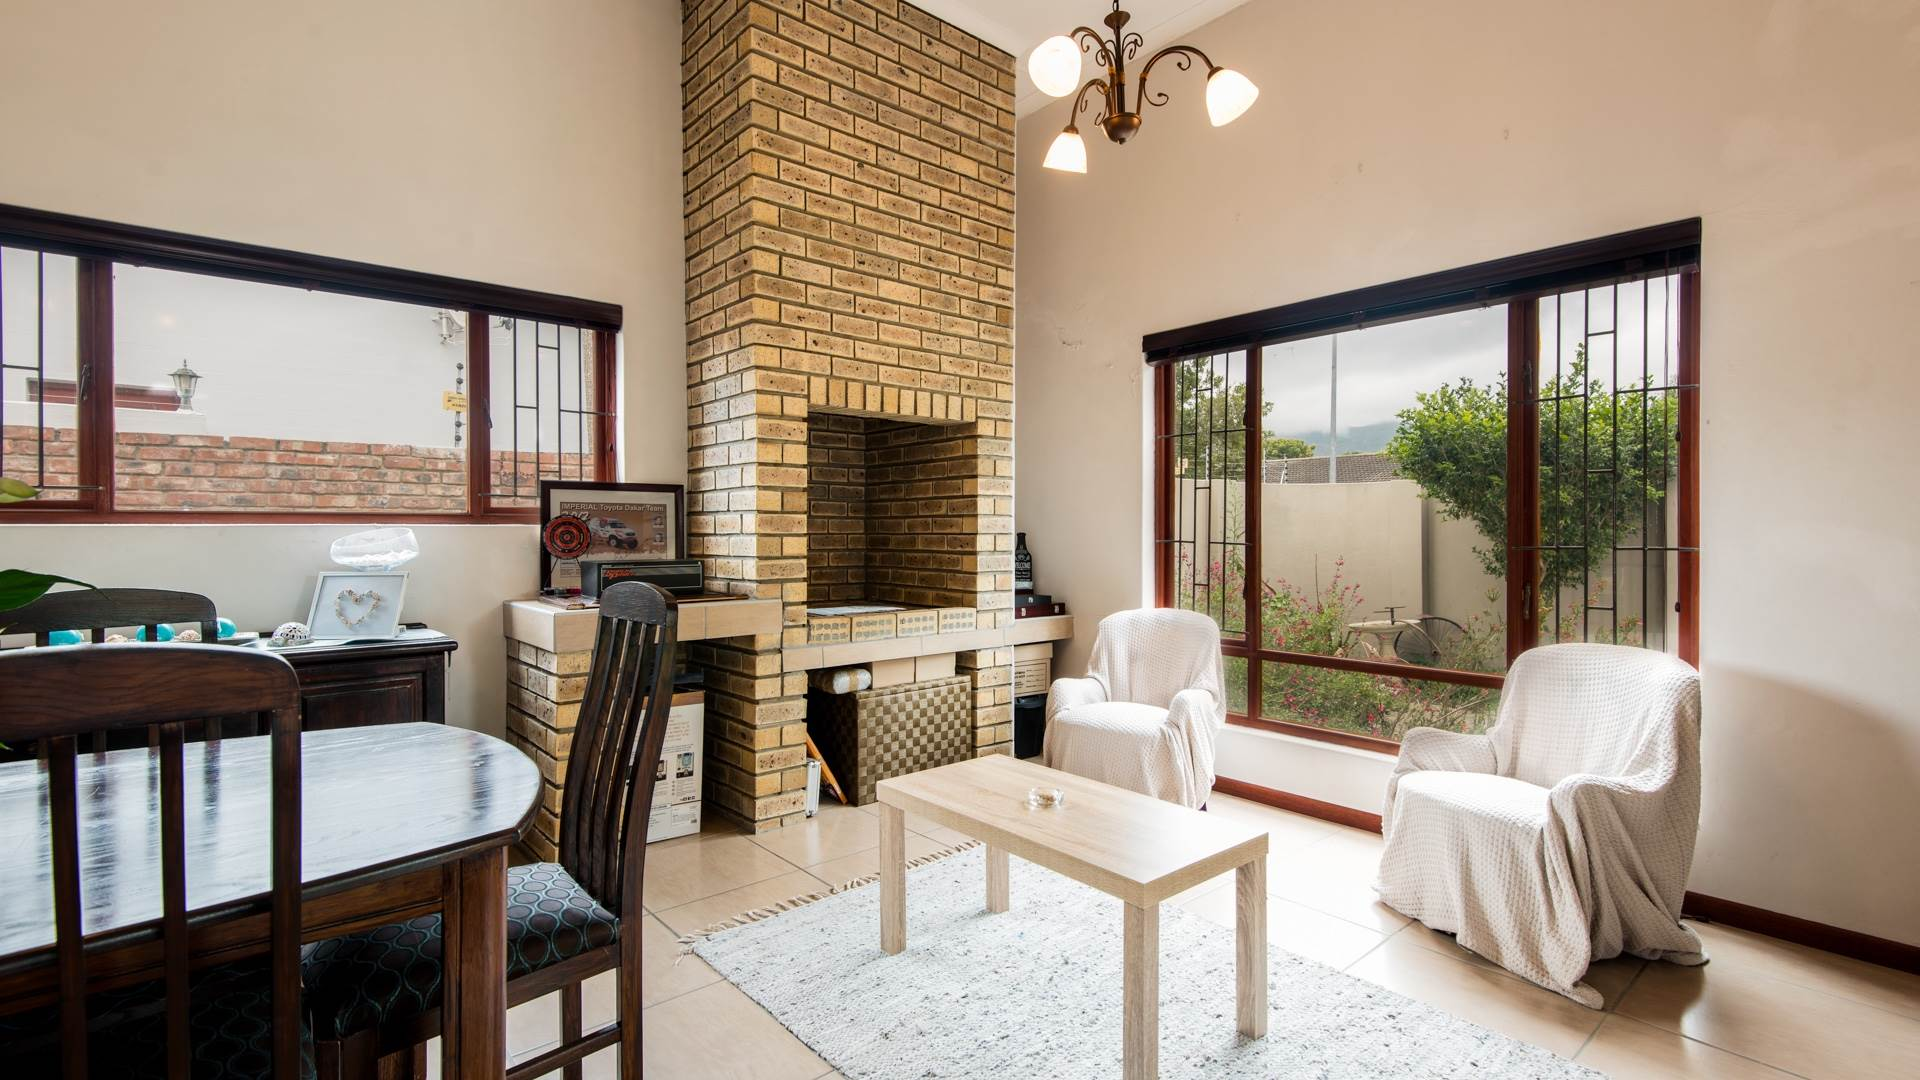 4 BedroomHouse For Sale In Denver Park